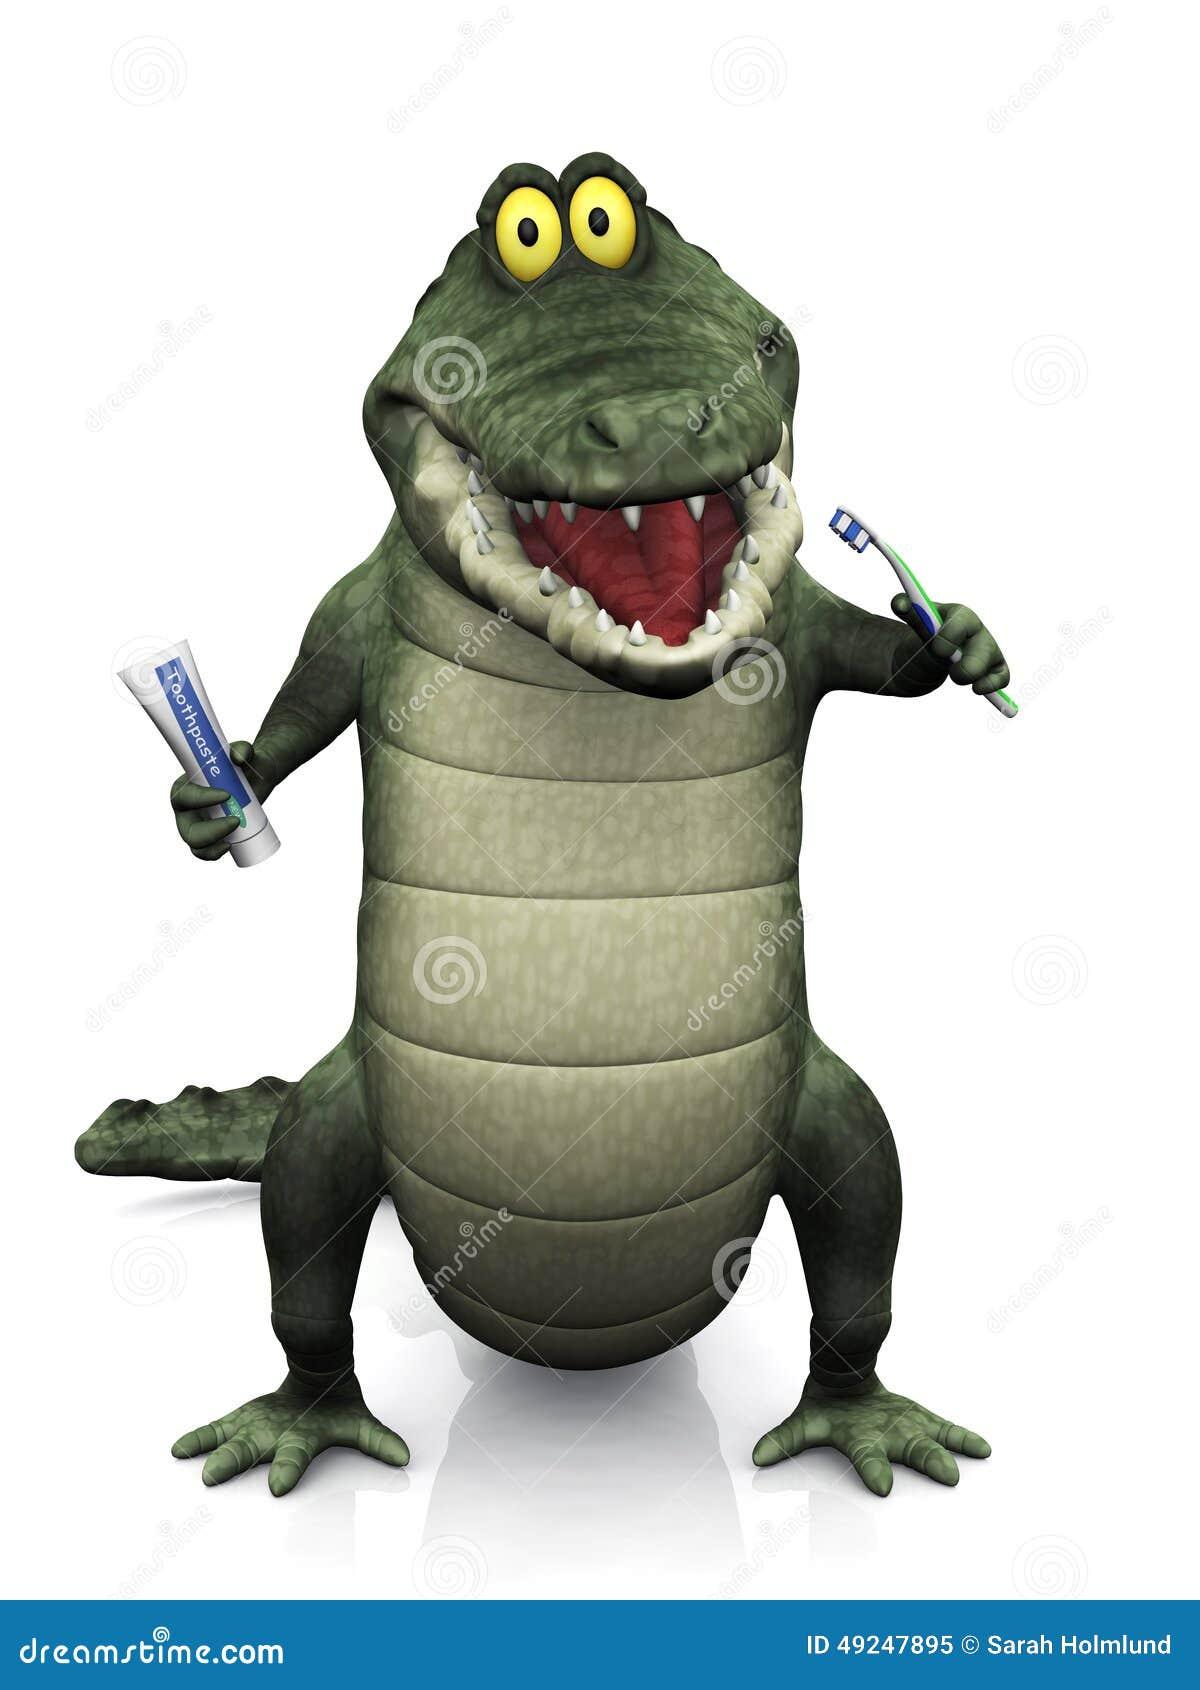 cartoon crocodile brushing his teeth  stock illustration